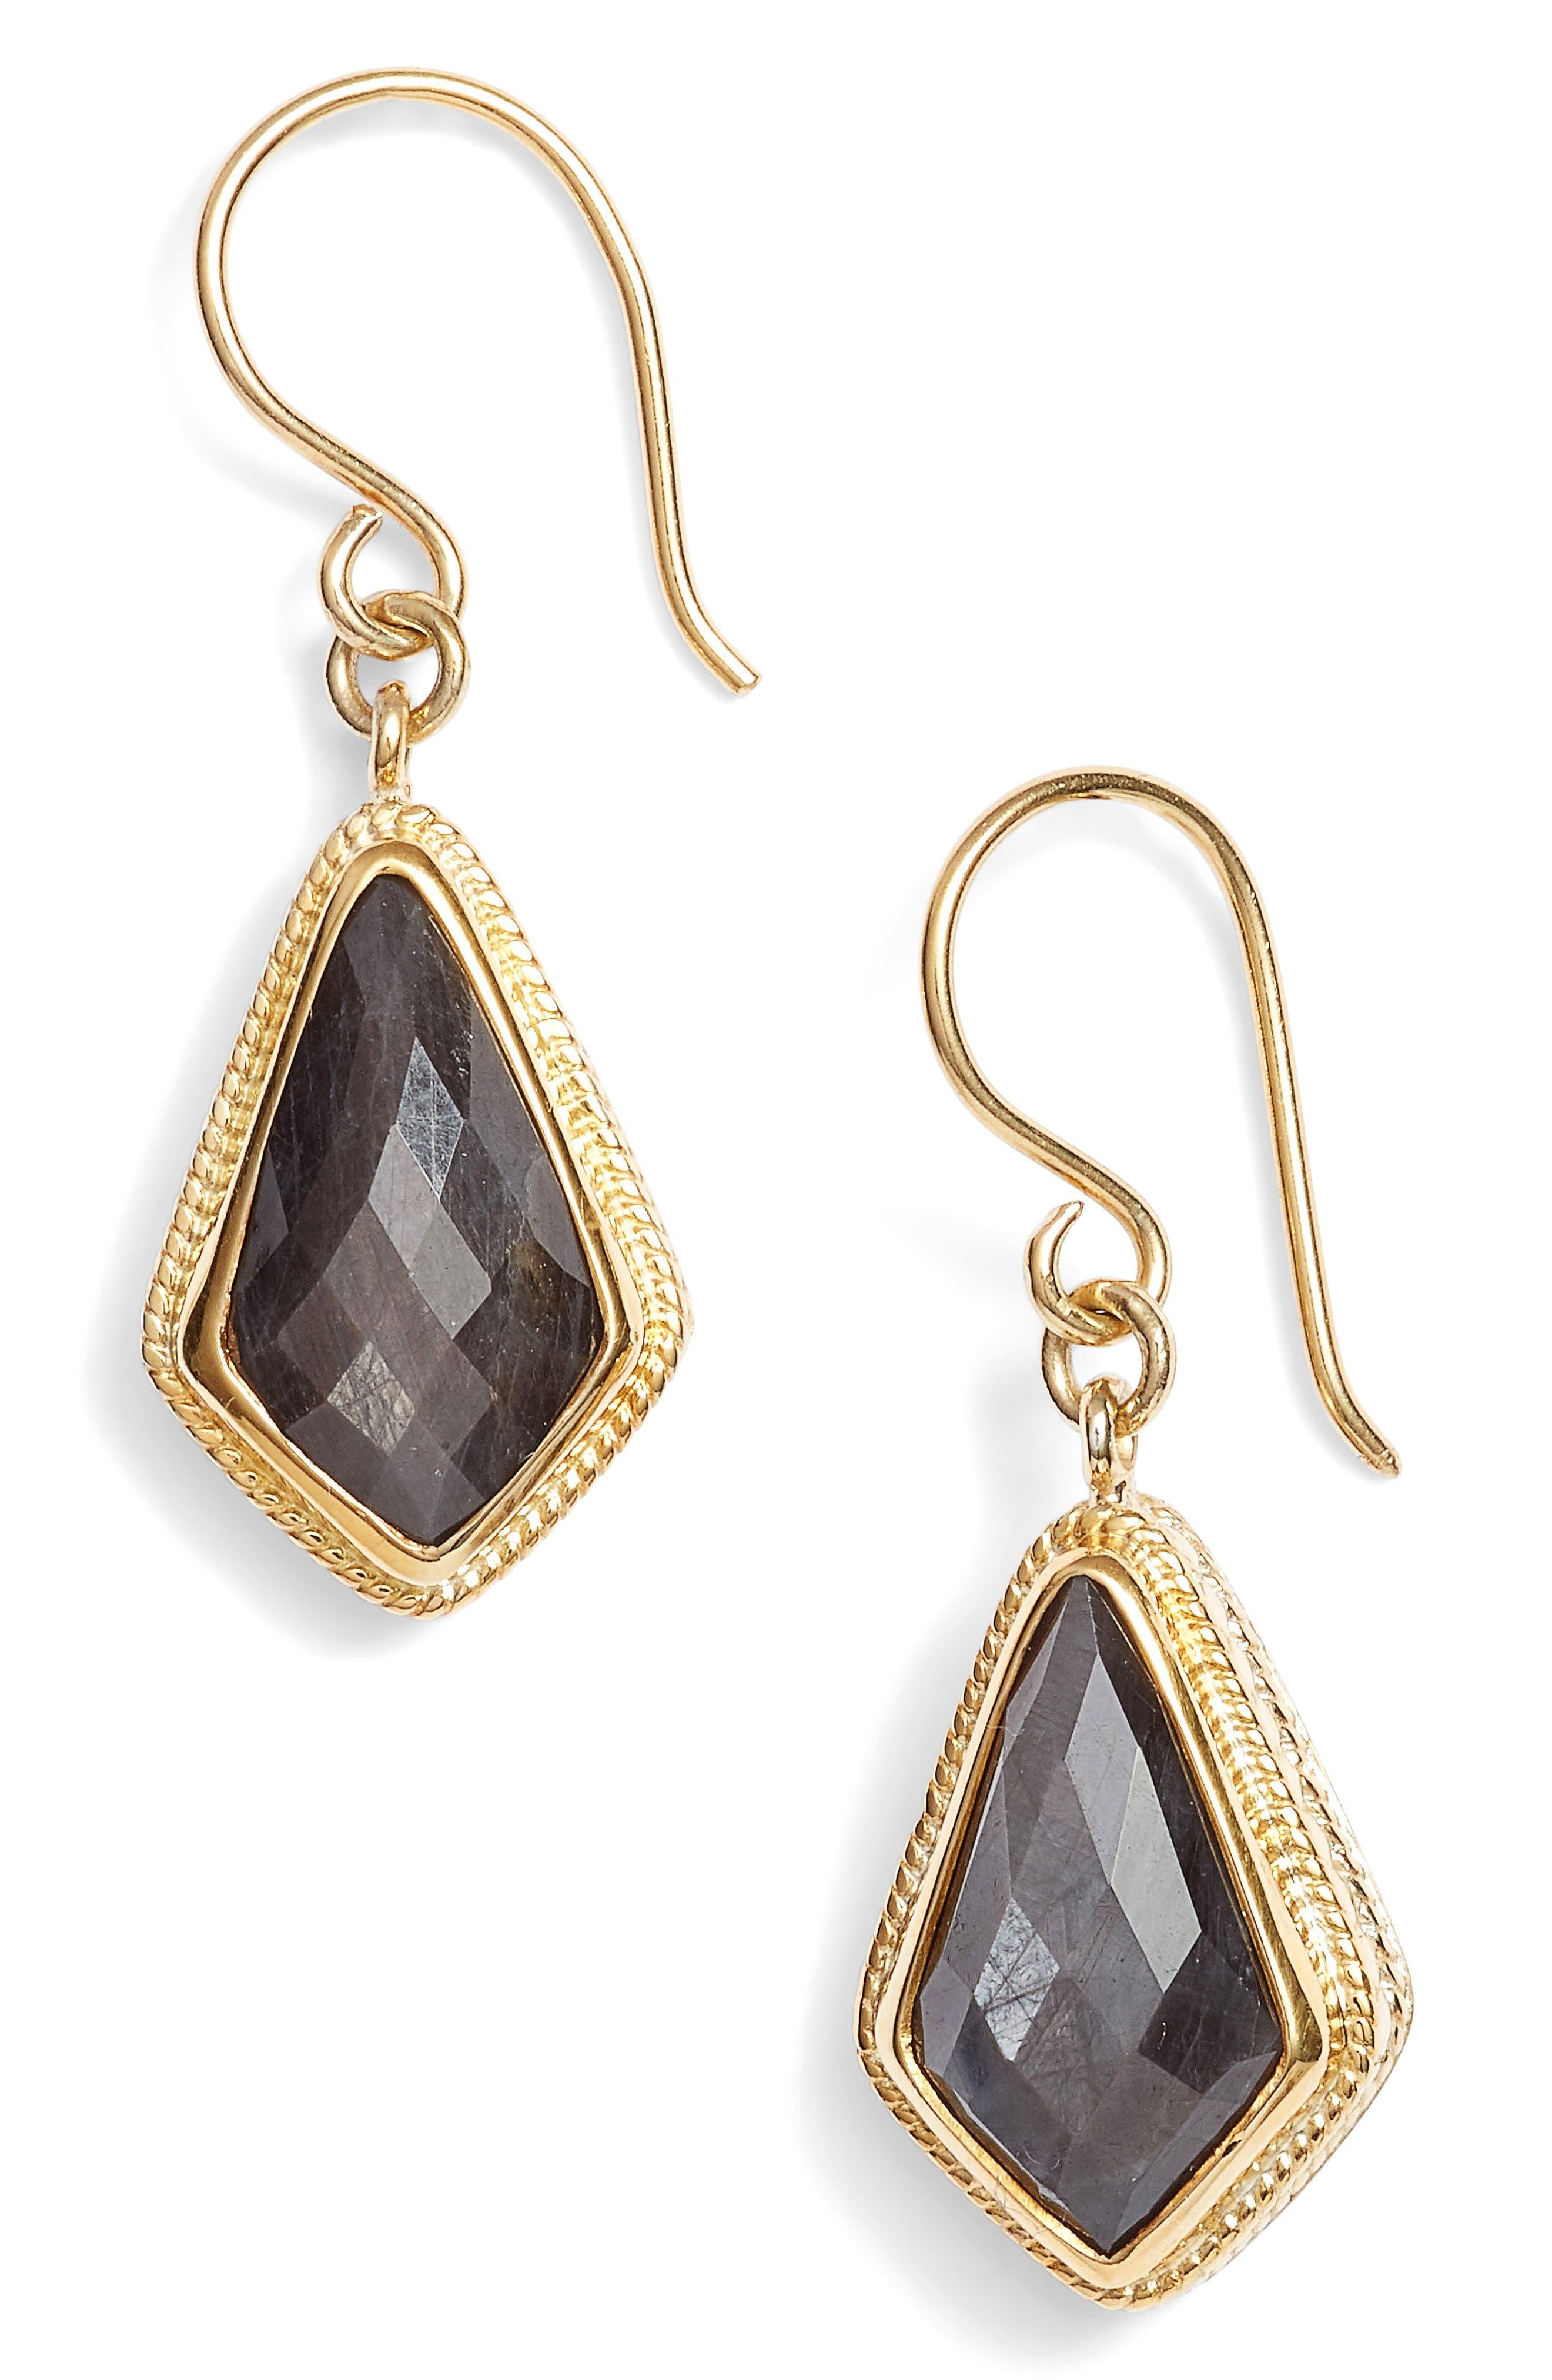 Main Image - Anna Beck Grey Sapphire Kite Earrings